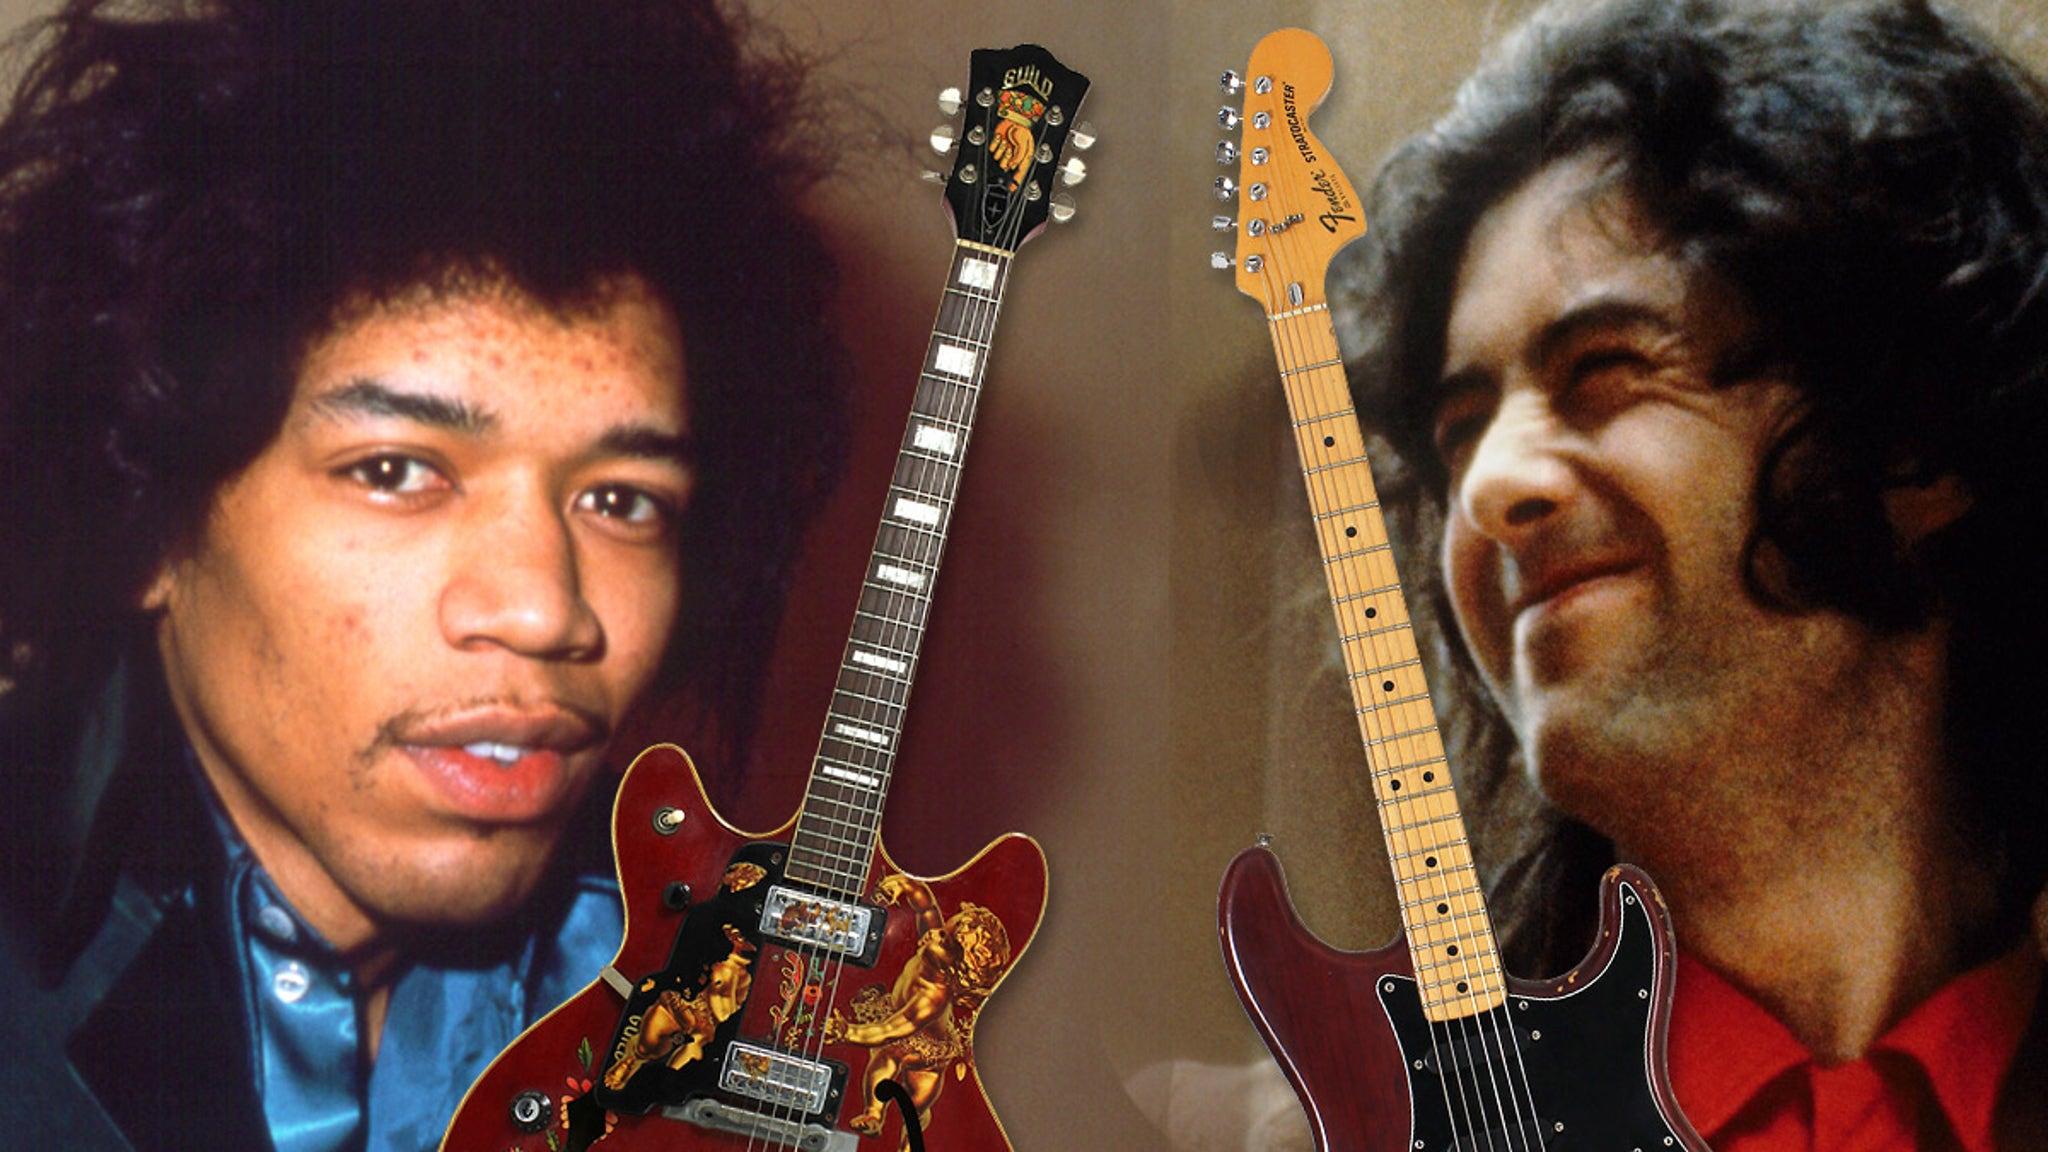 Jimi Hendrix, Jimmy Page, Eric Clapton Guitars Hit Auction Block - EpicNews